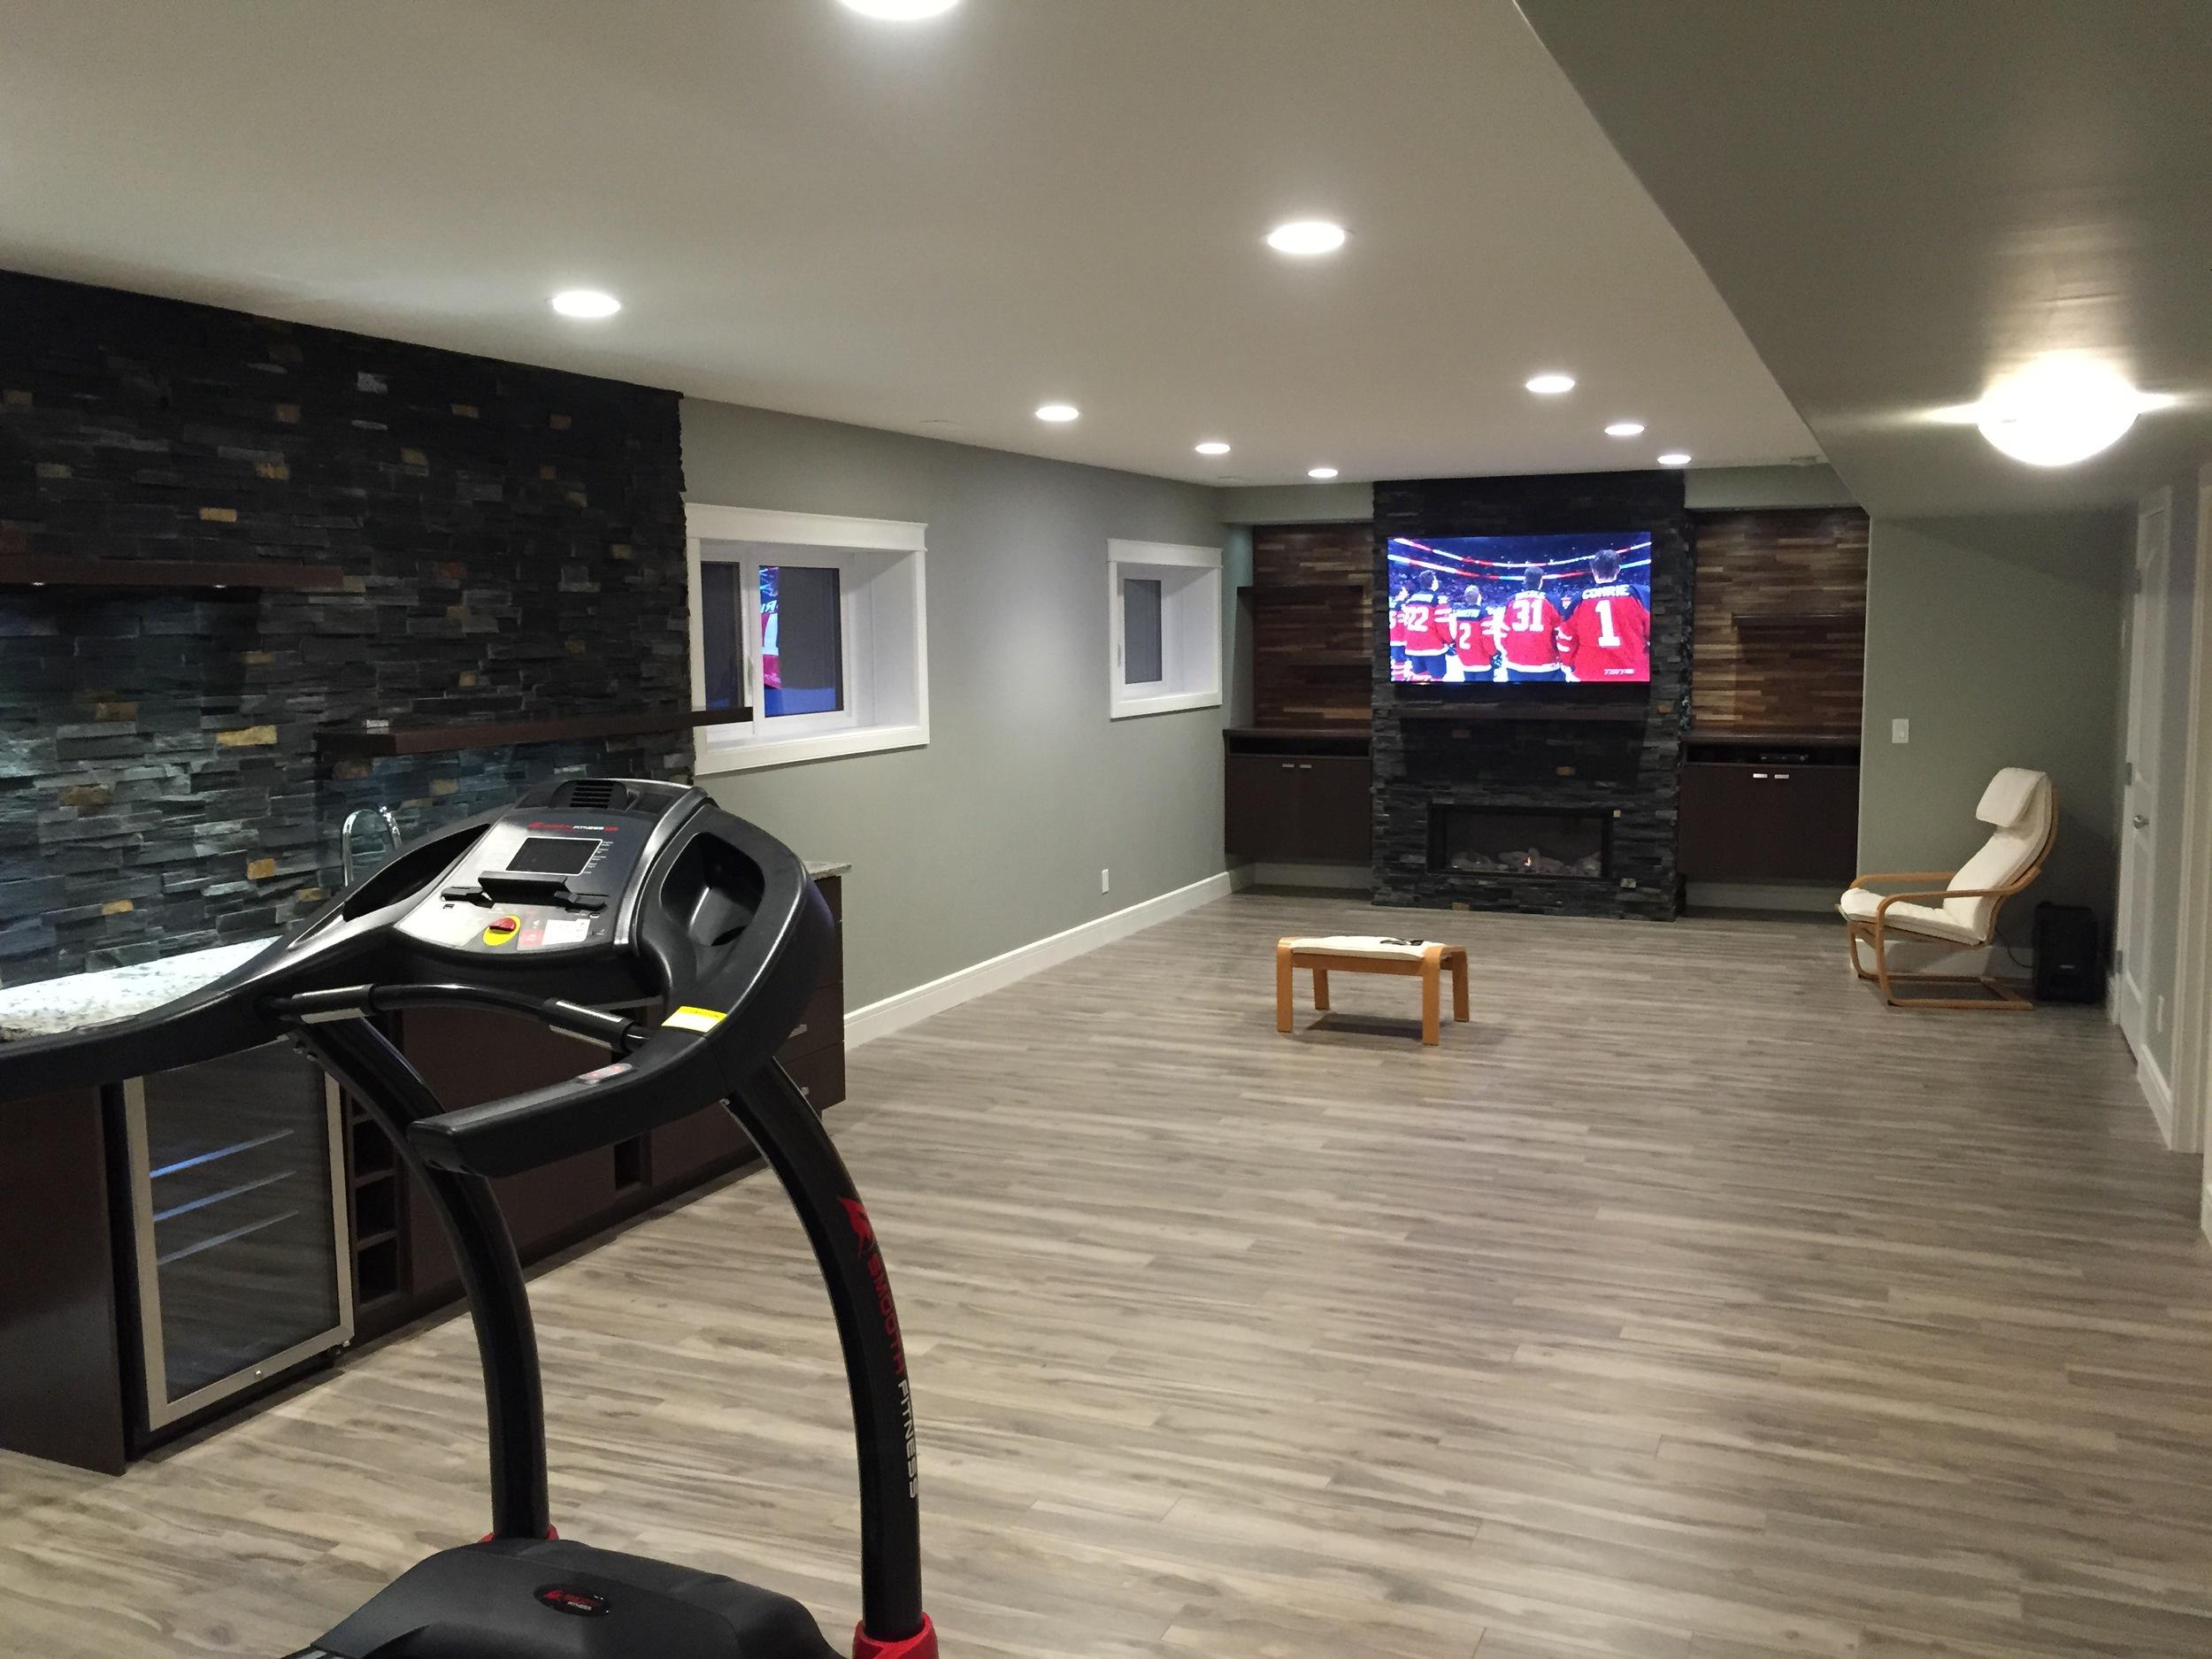 Basement renovation Saskatoon, fireplace,wet bar, stone work, flooring, trusted contractor